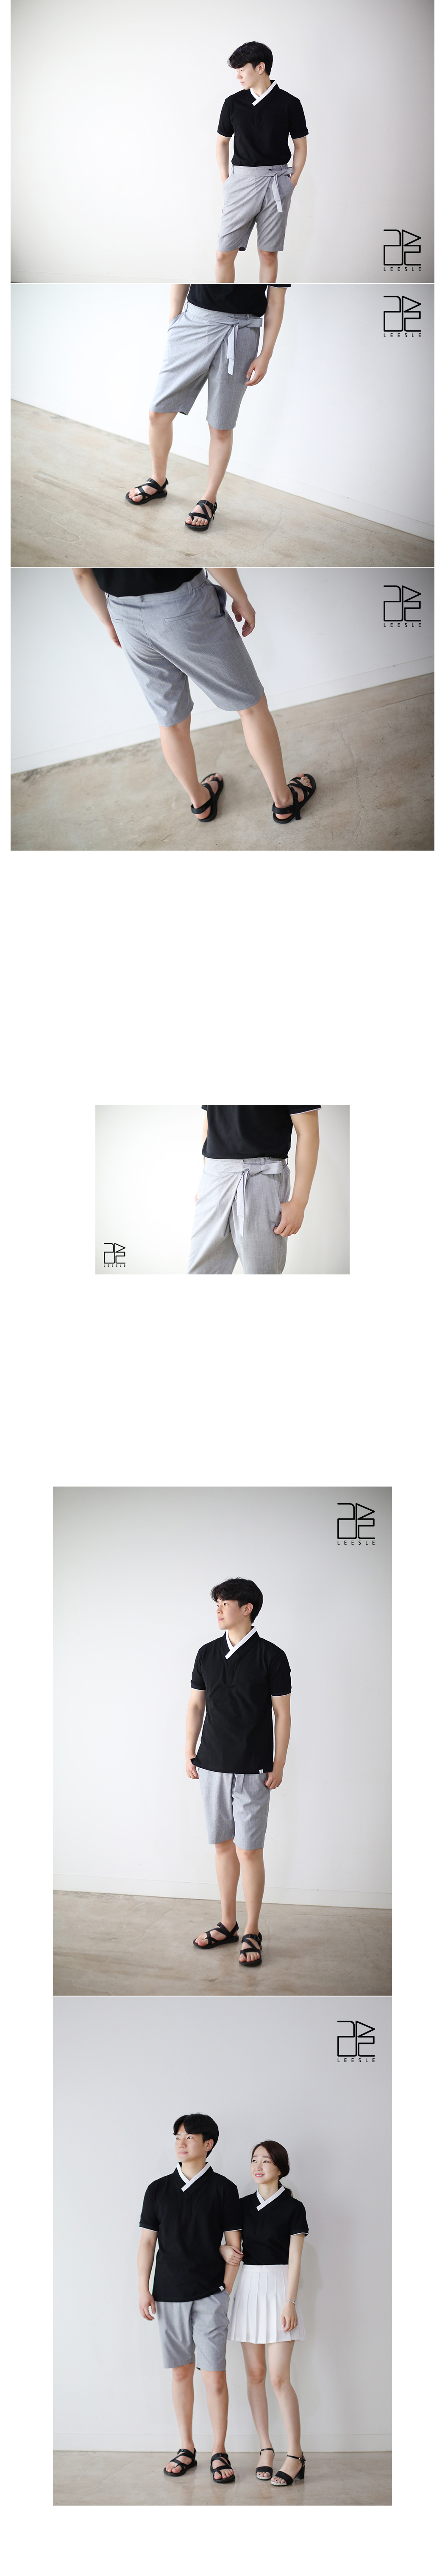 [ leesle ] Sapok-made 式等半长裤[ MELANGRAY ]